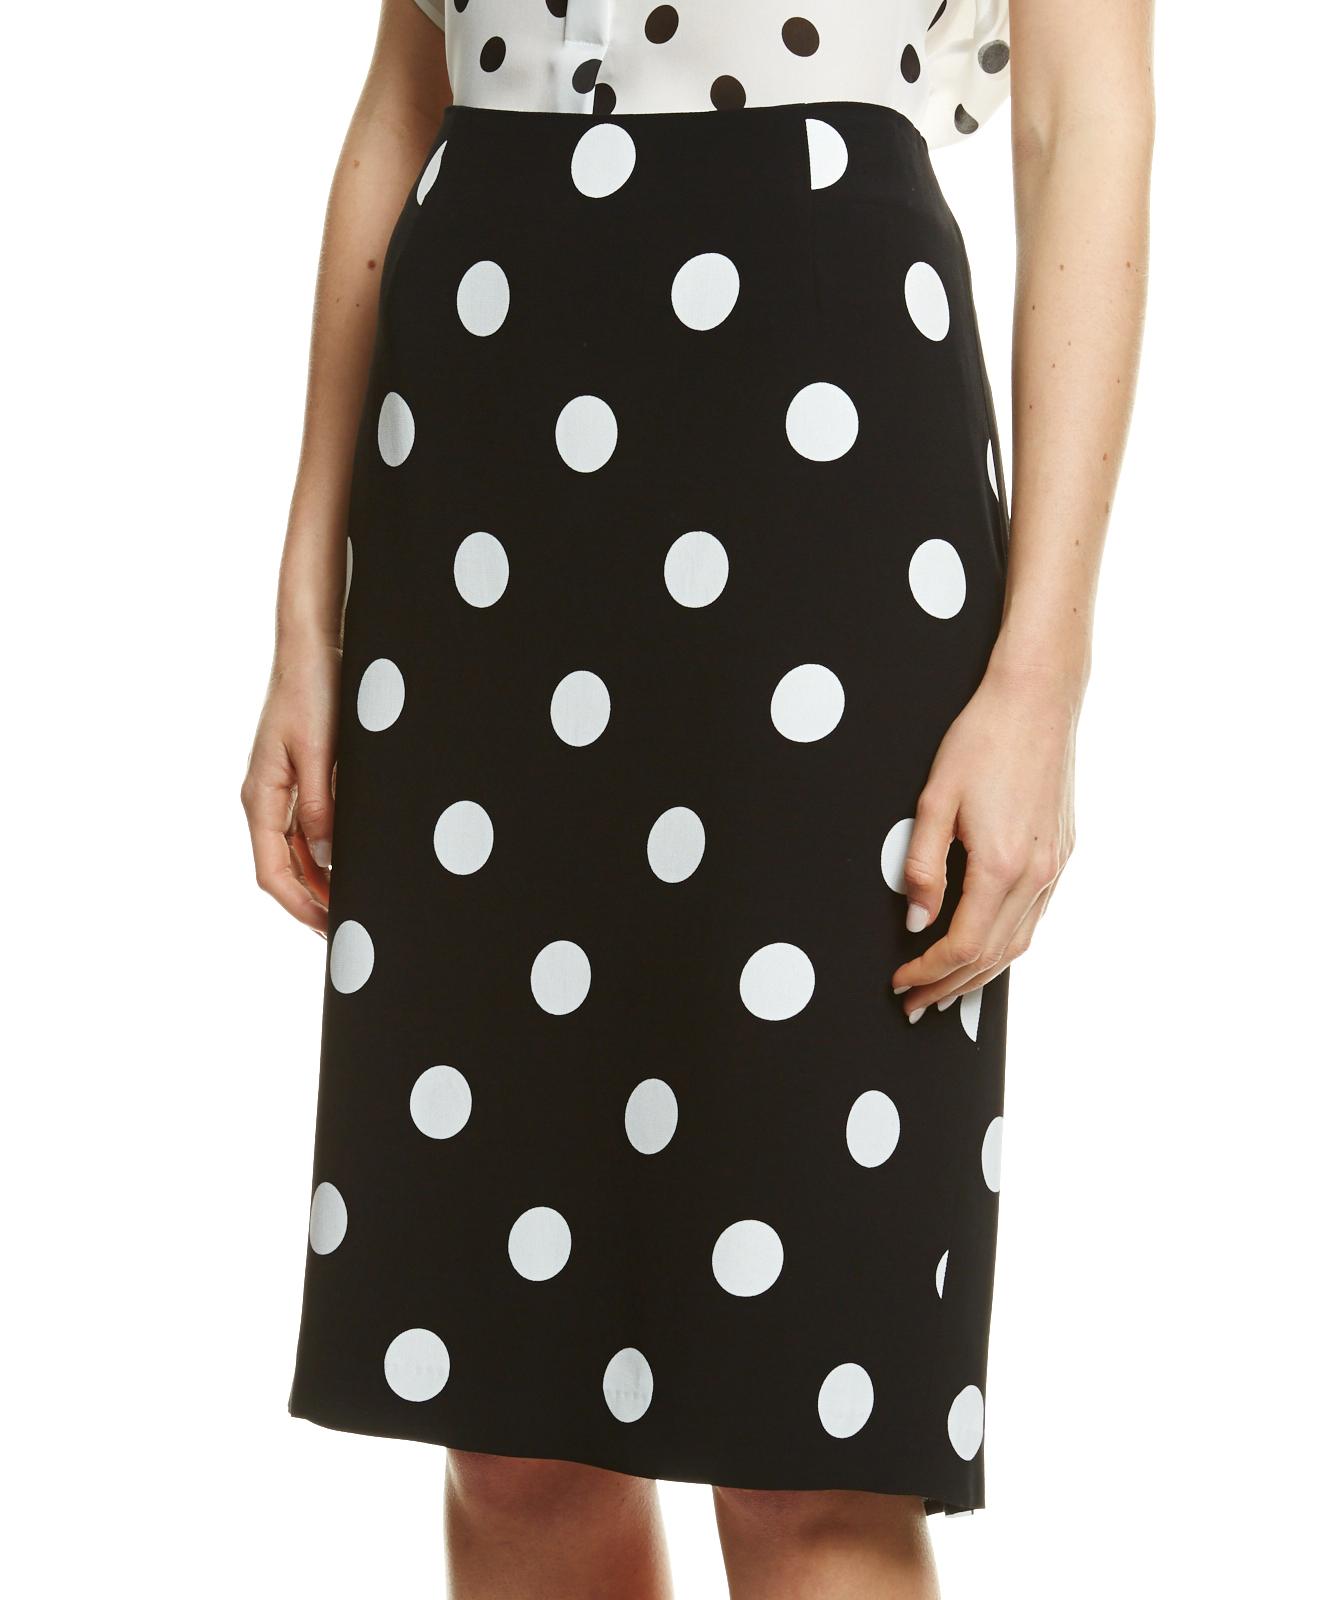 Signature Polka Dot Skirt, Sportscraft Online